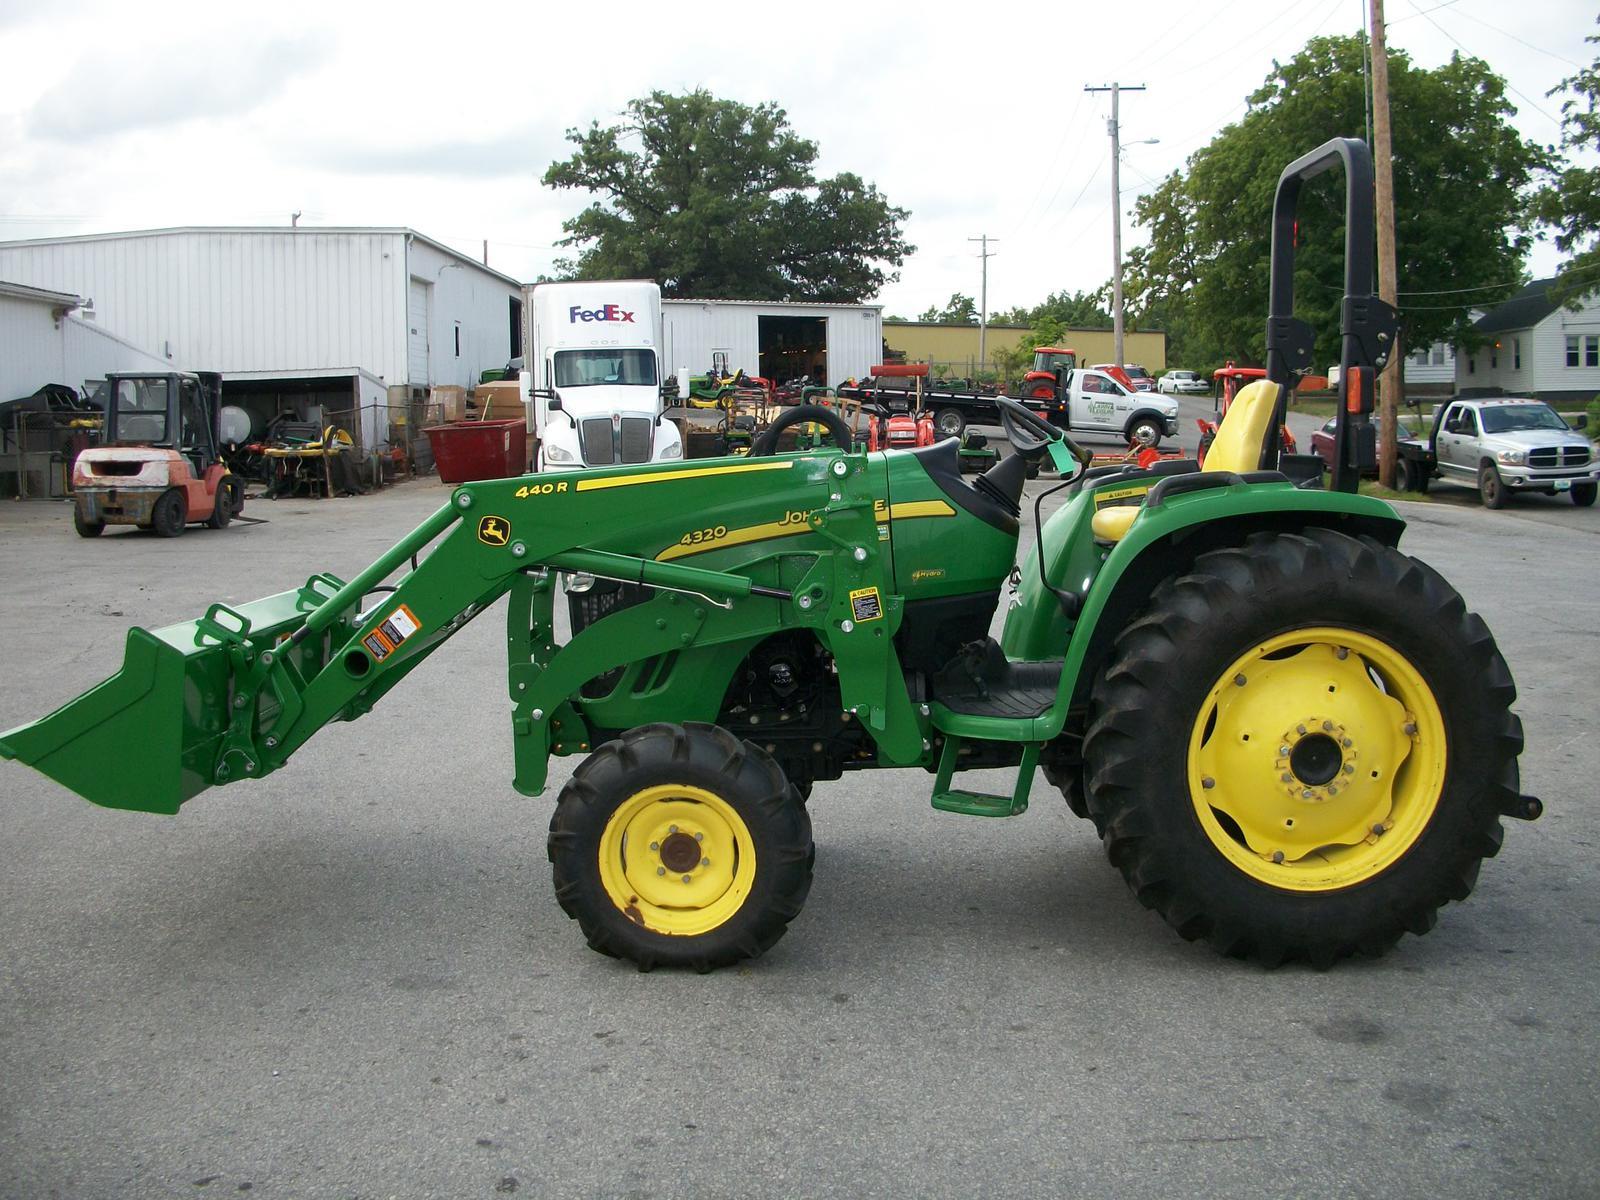 2007 John Deere 4320 Compact Tractor (48 Hp) For Sale In Columbia JD 4320